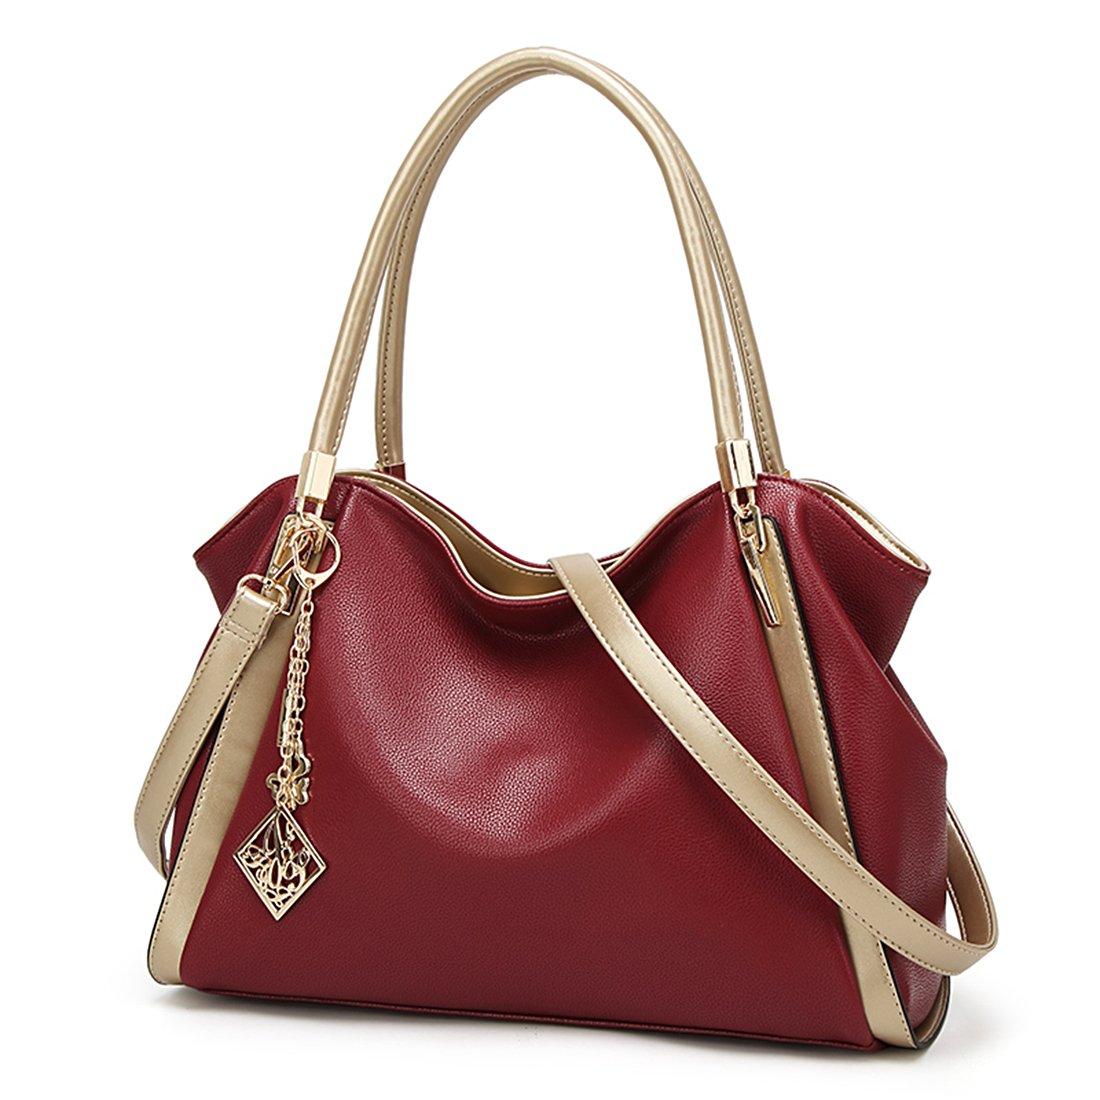 Soft Leather Purse Handbag Women Tote Hobo Bag Crossbody Shoulder Bag Purse(red)